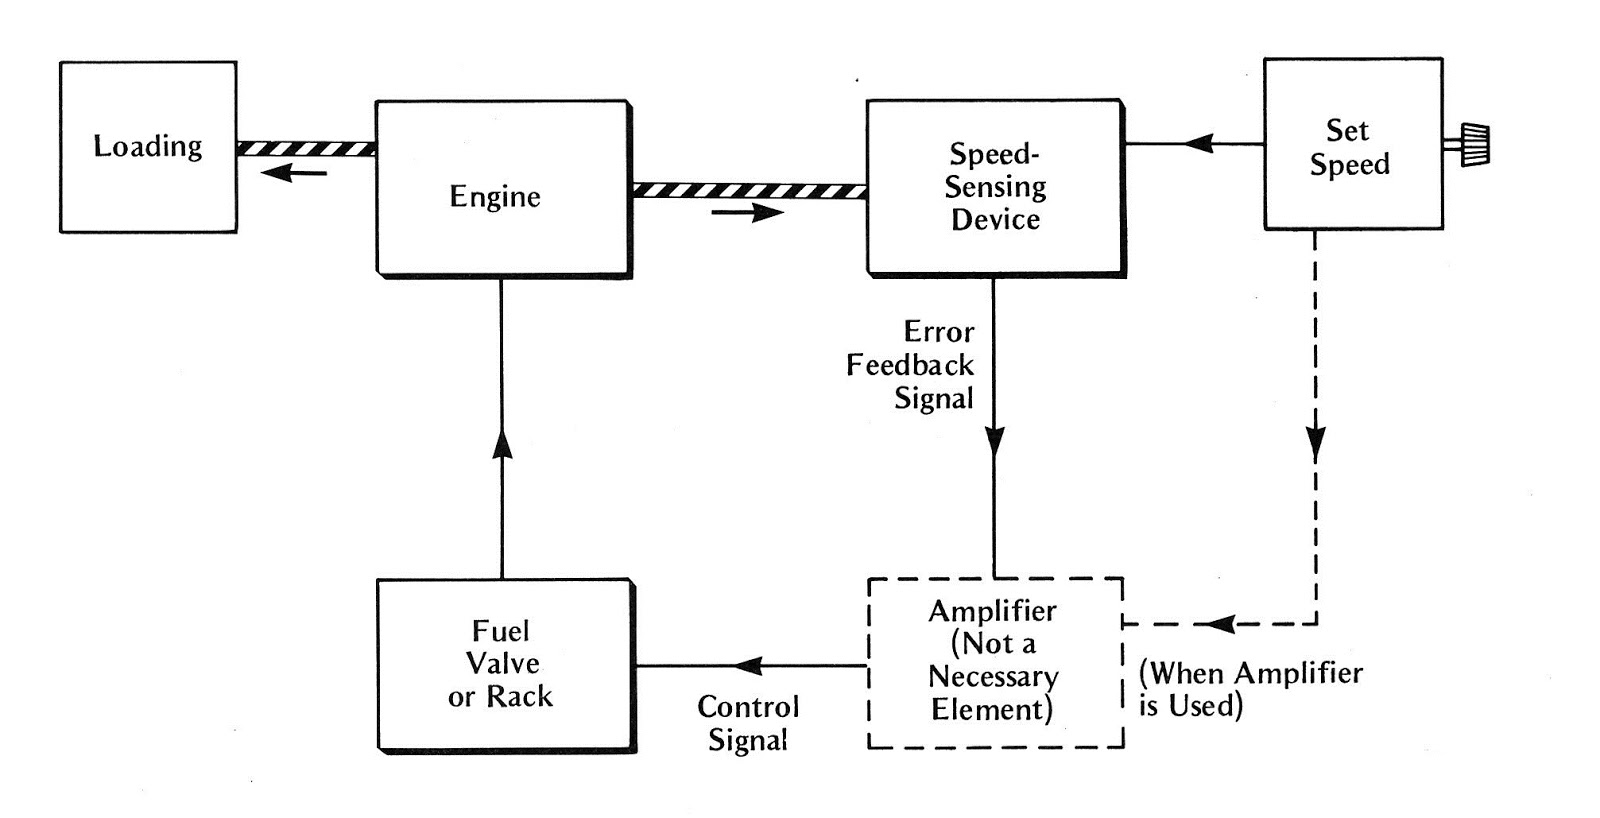 Diesel generator diagram titan generator wiring diagram save fancy diesel generator diagram genset wiring diagram olympian silverado trailer harness diesel generator swarovskicordoba Choice Image